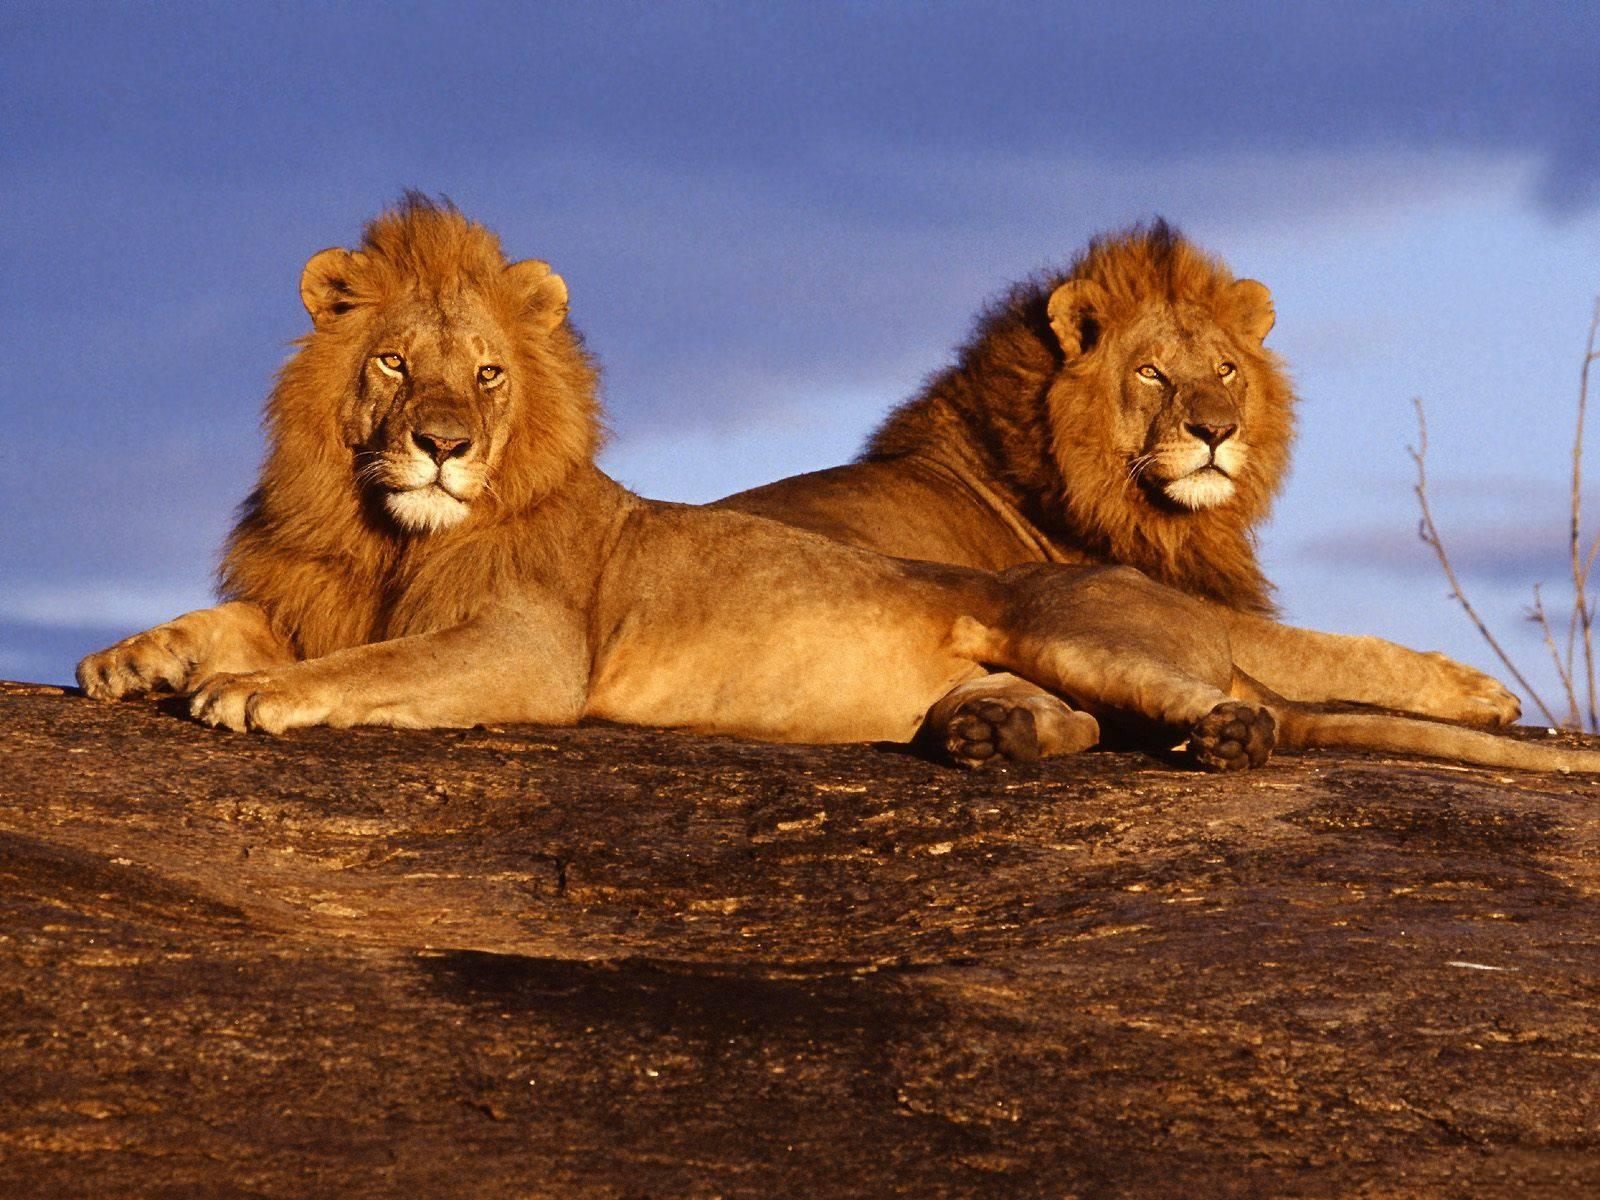 Male lions pics wallpaper 3d hd picture design download for 1600x1200